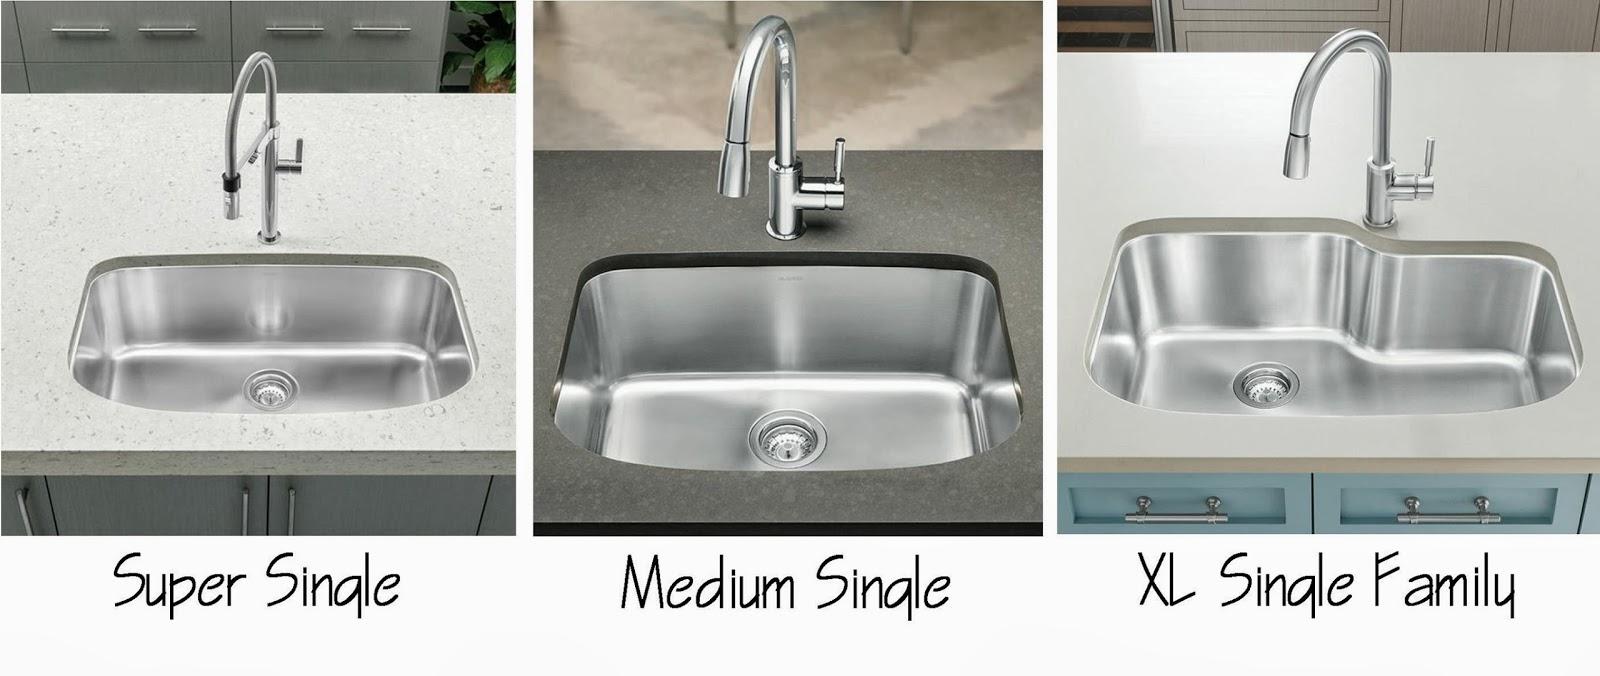 Blanco Sinks India : Blanco Kitchen Sinks. Latest Blanco Performa Kitchen Sink Kitchen Sink ...